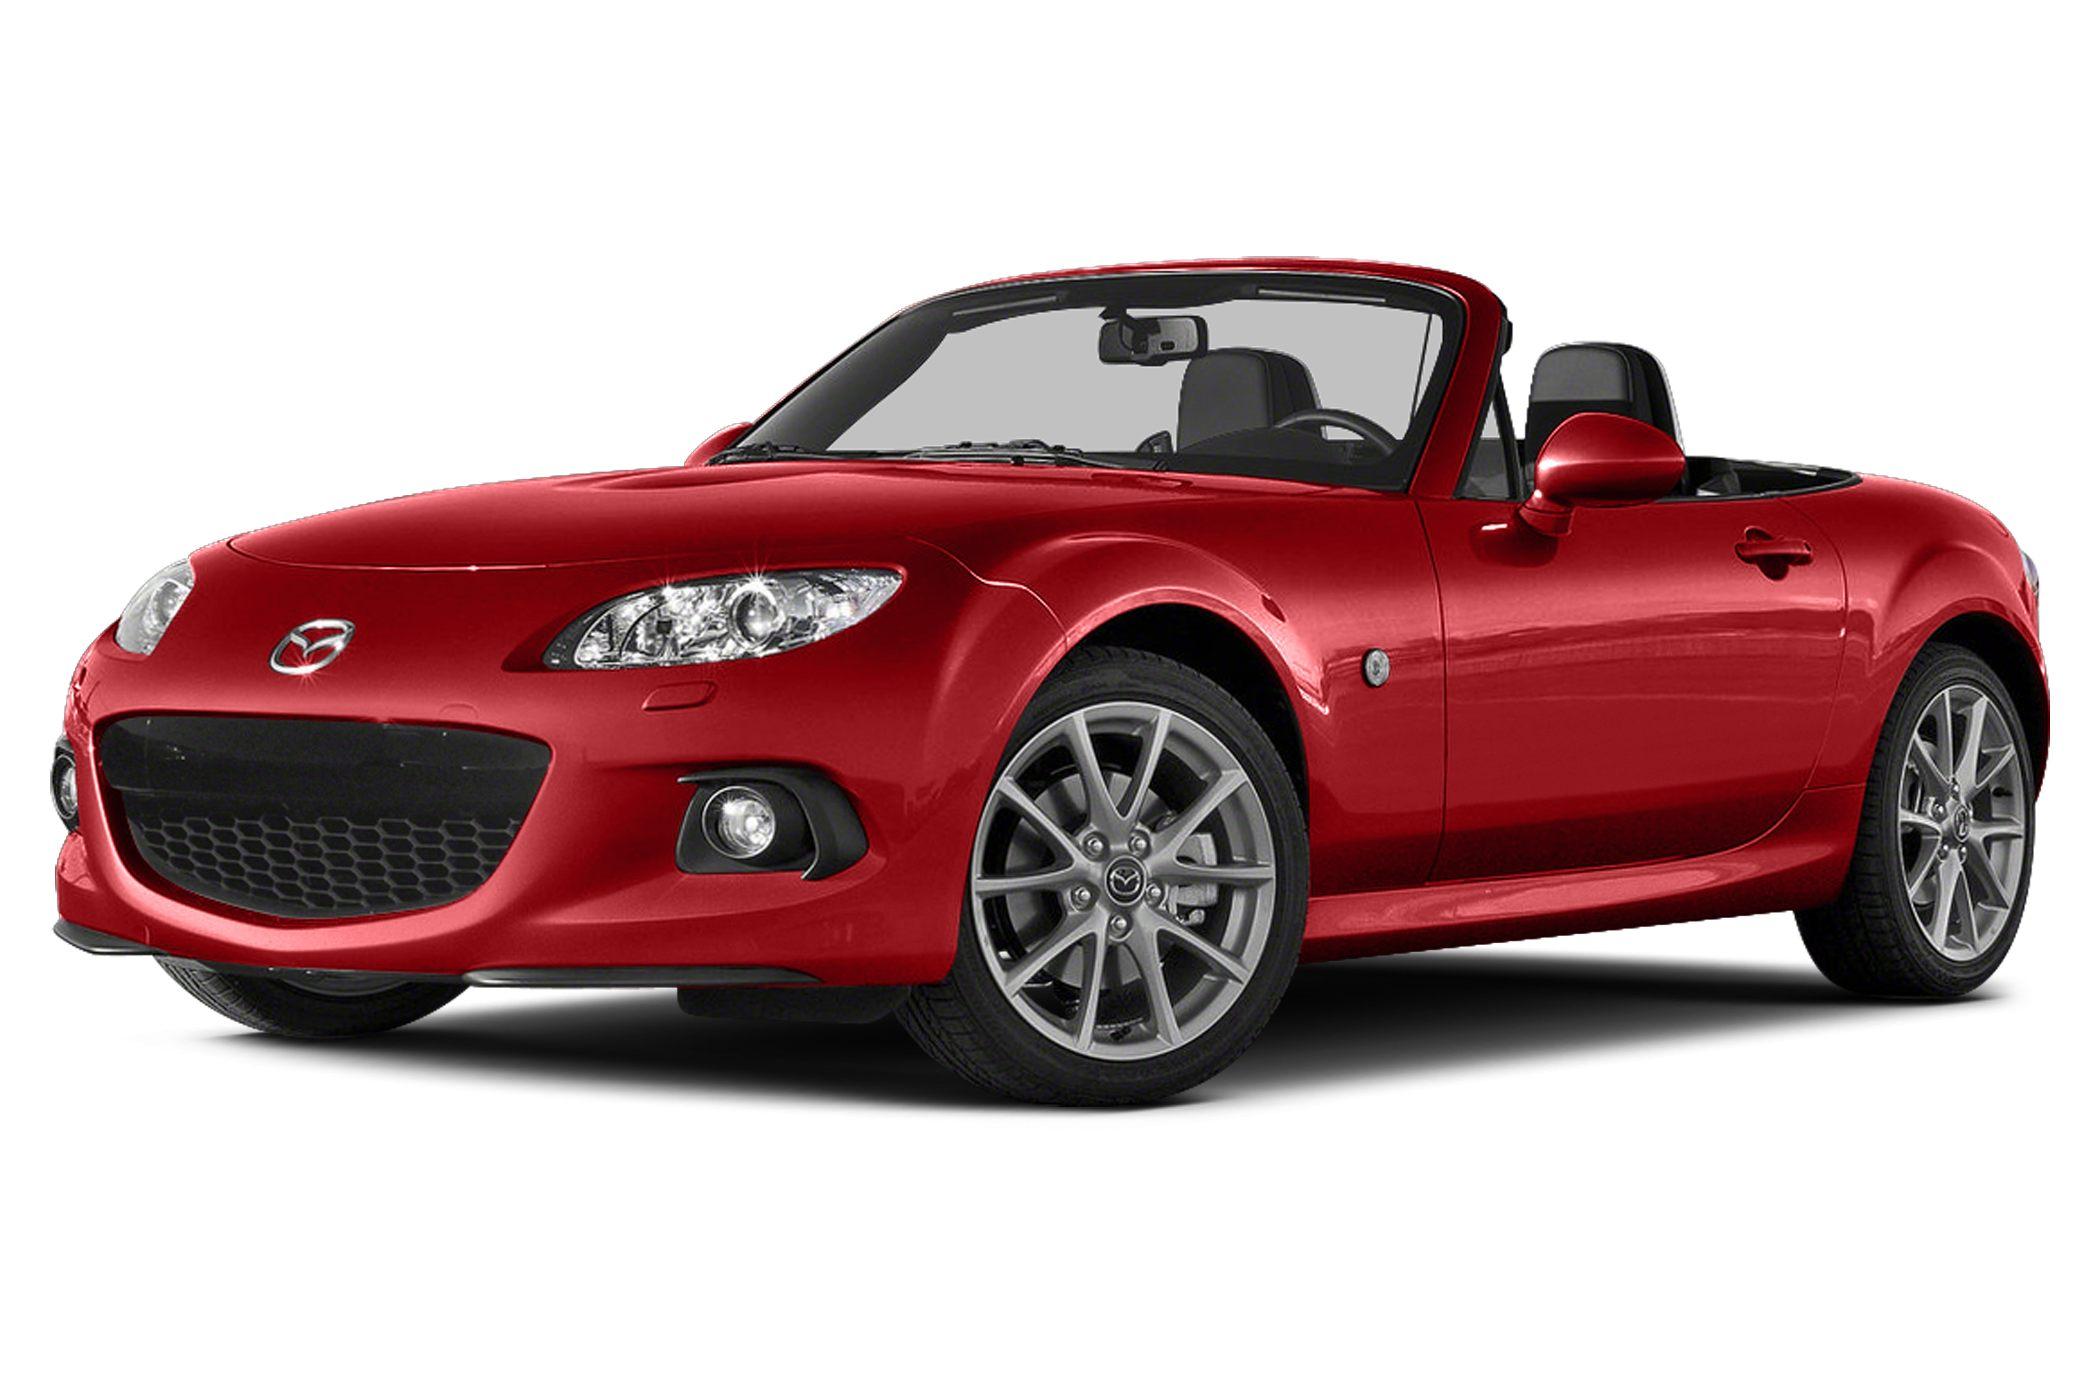 2014 Mazda Mx 5 Miata Specs And Prices